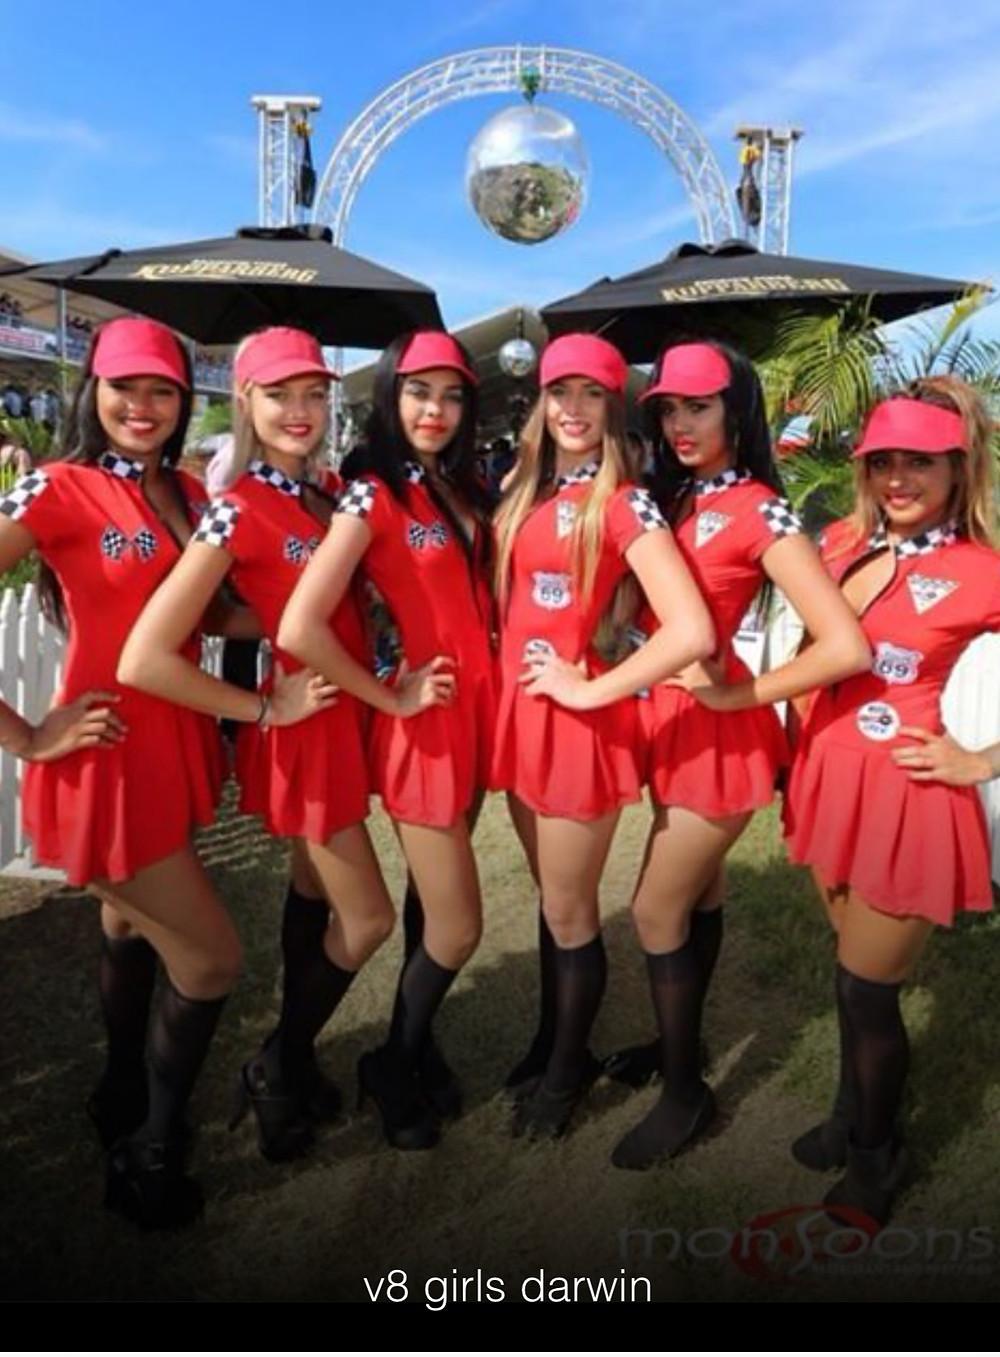 Deb at iSew4U rescues V8 Girls costume